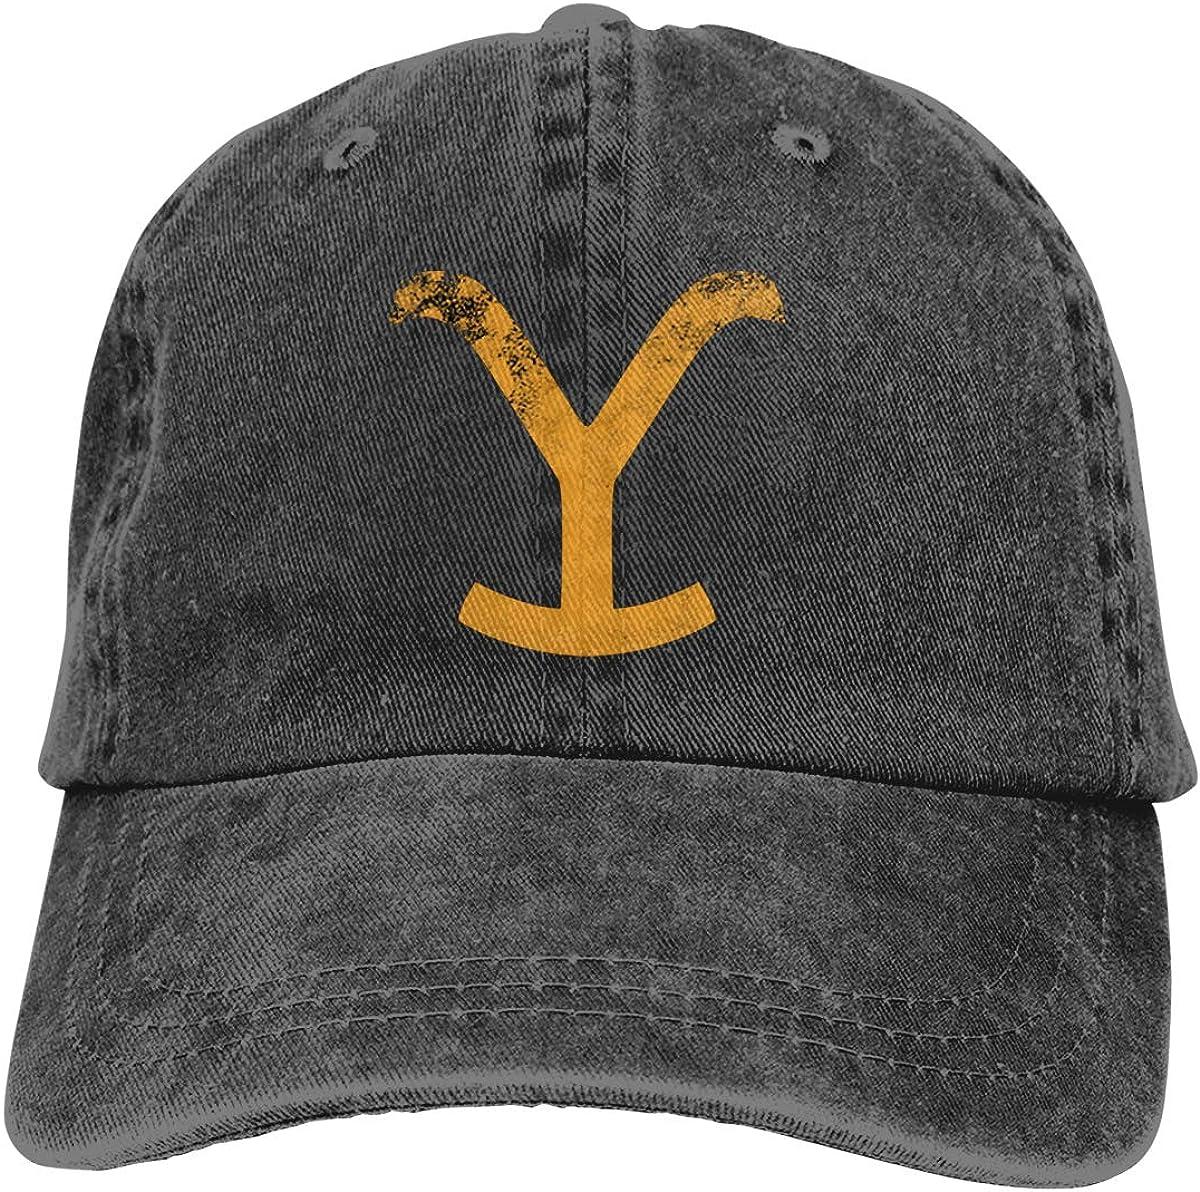 Yellowstone Dutton Ranch Adjustable Denim Hats